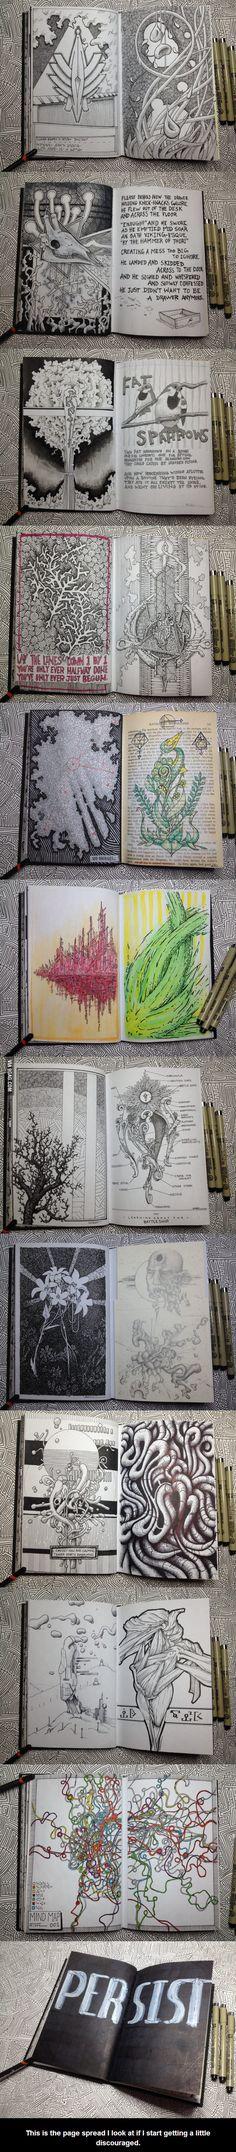 Awesome sketchbook!